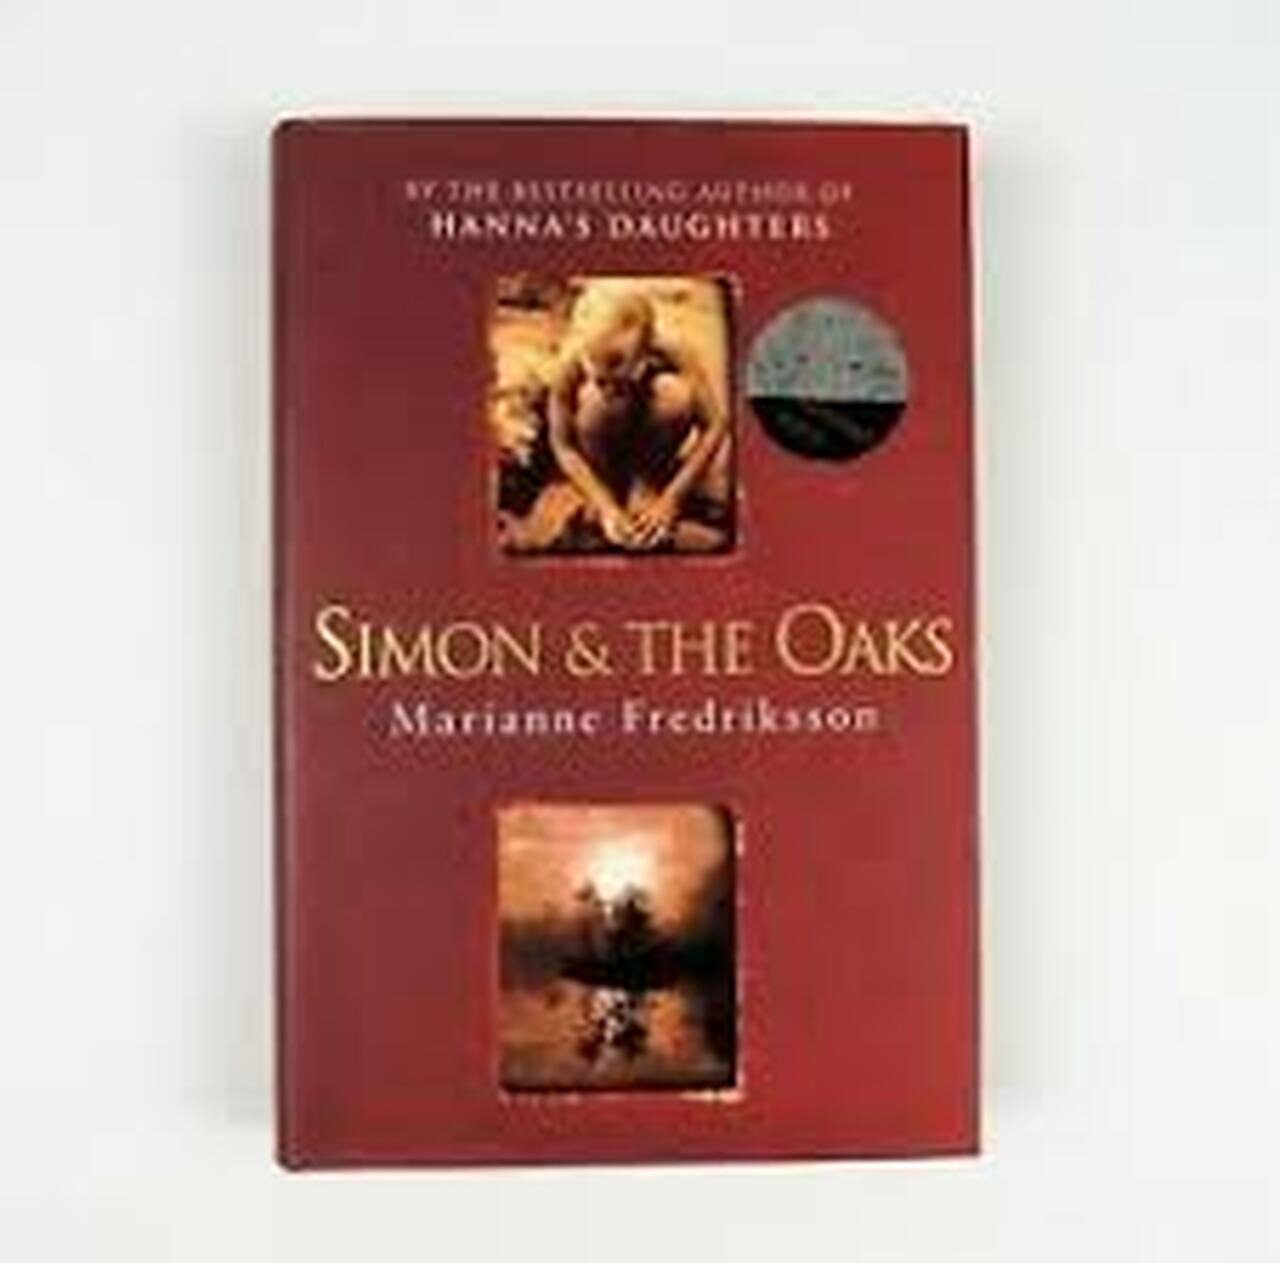 Simon And The Oaks _ MARIANNE FREDRIKSSON